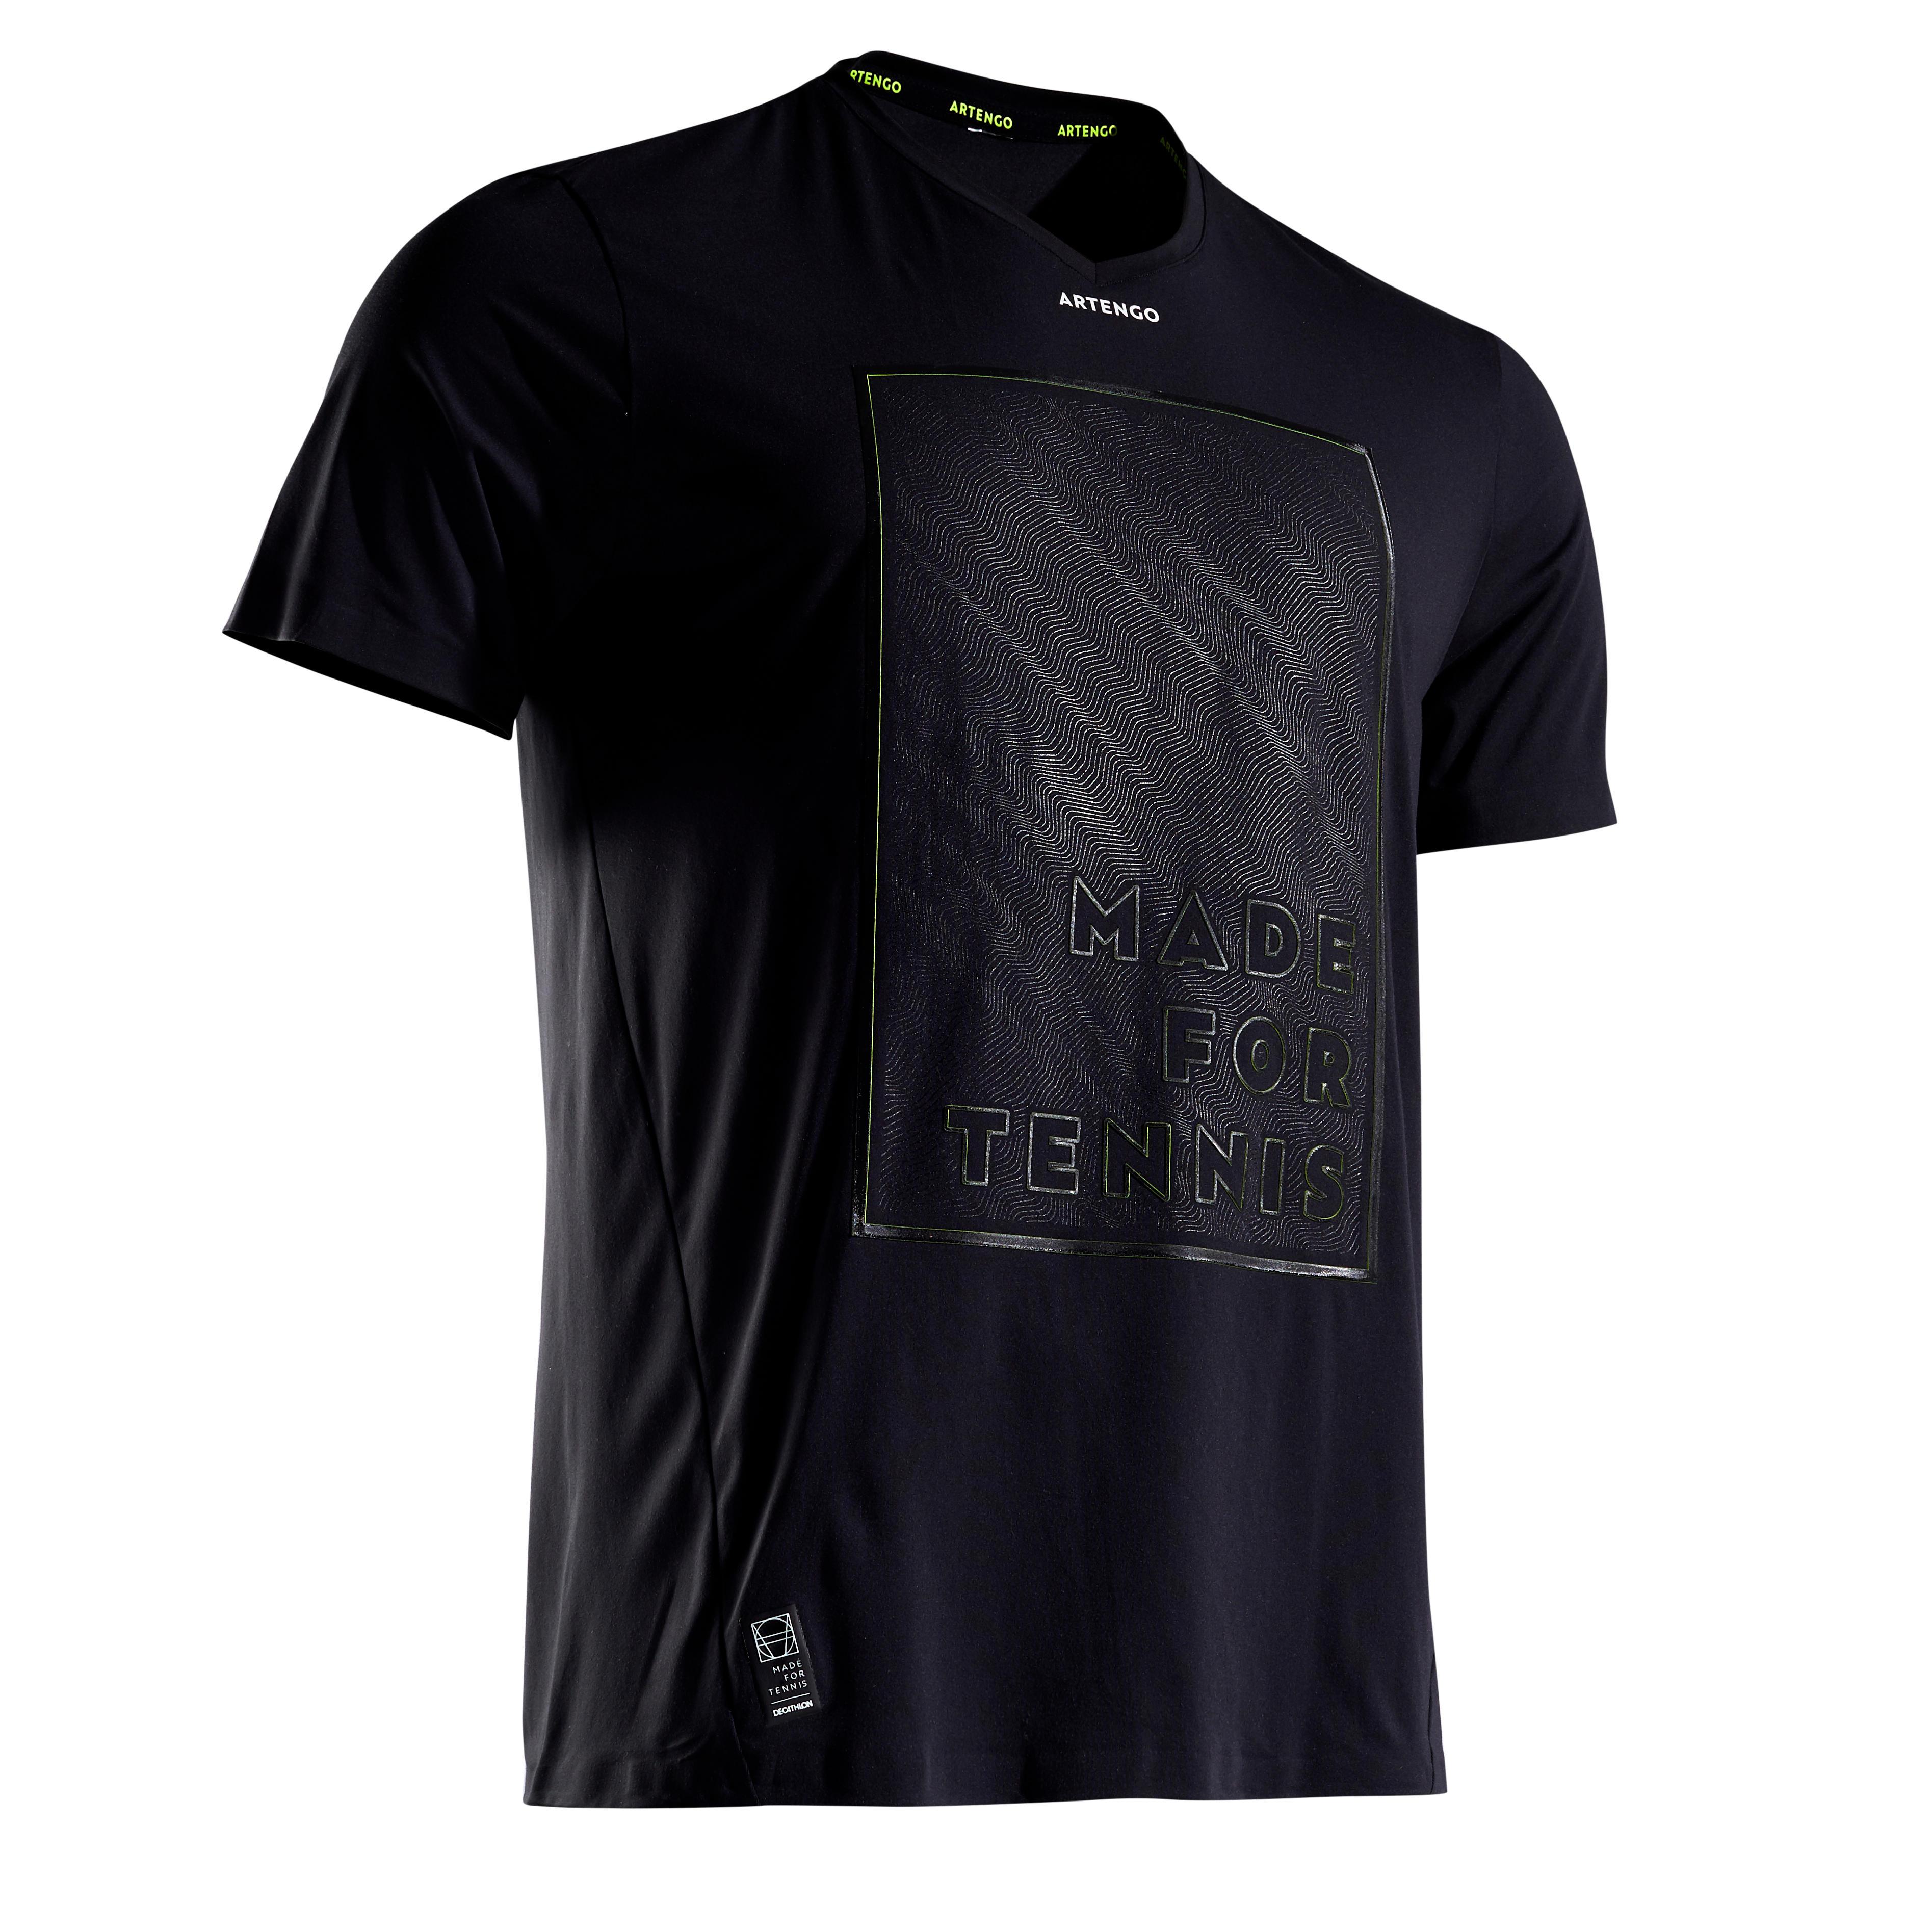 Tennisshirt 900 Herren Light 900 | Sportbekleidung > Sportshirts > Tennisshirts | Artengo